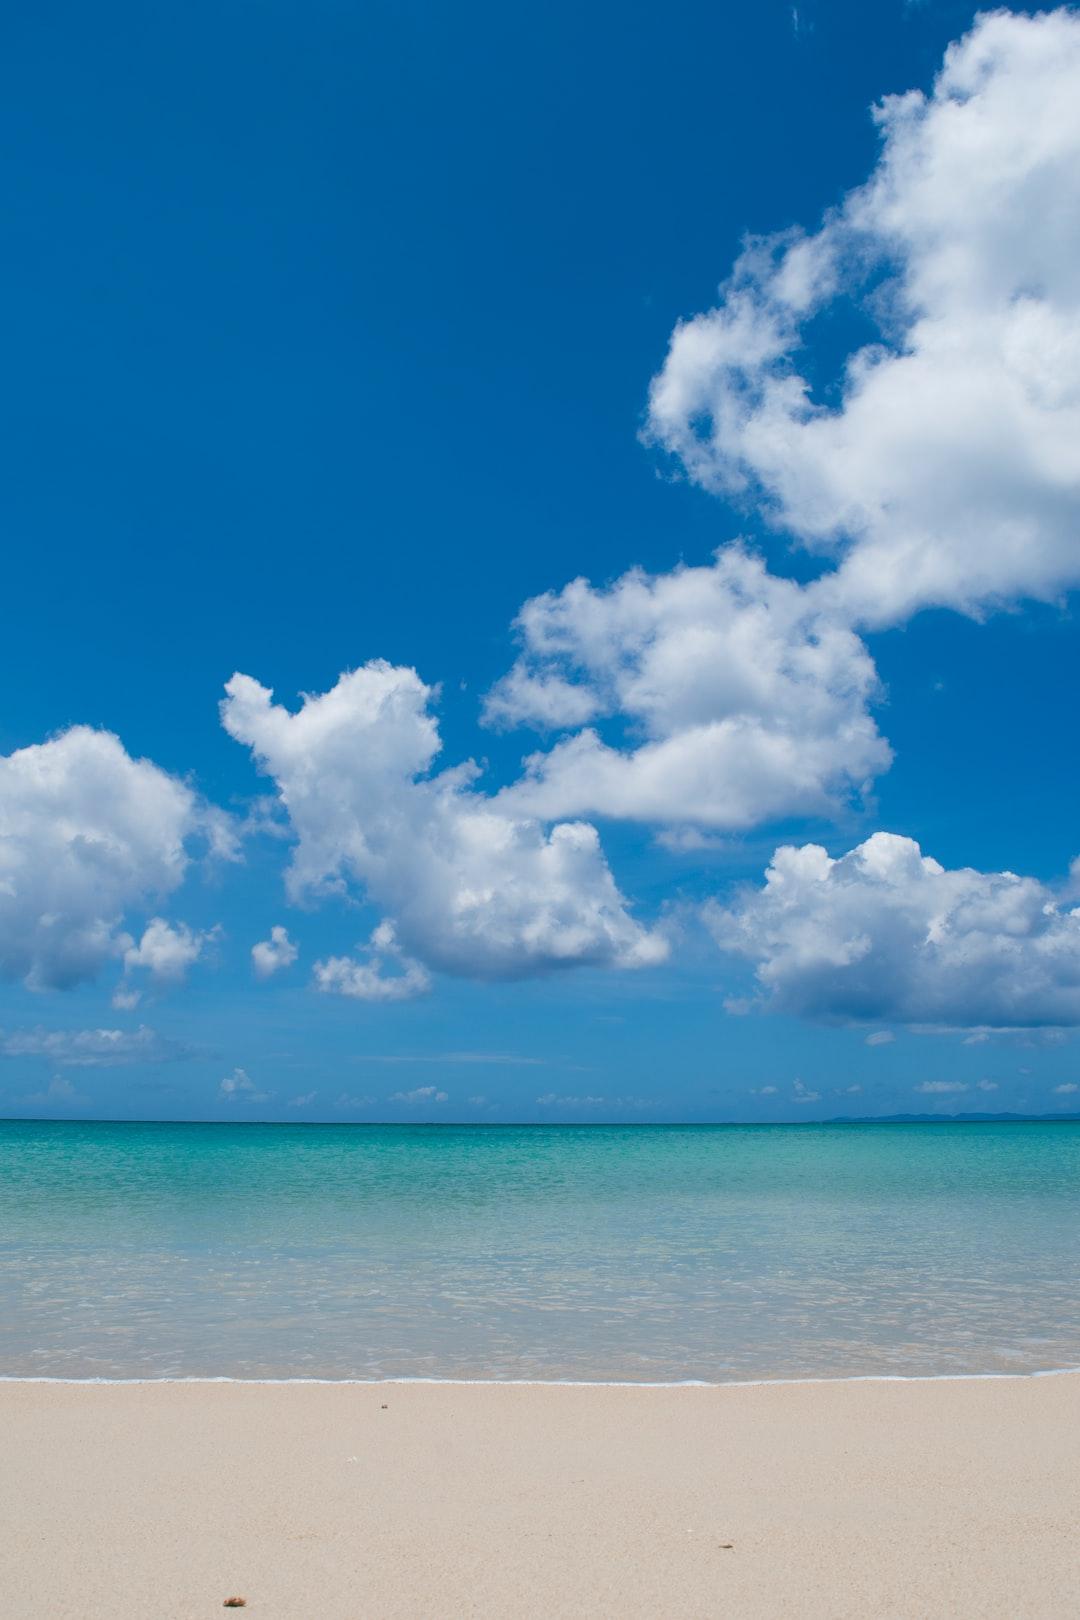 A beach with blue sky in Okinawa Japan